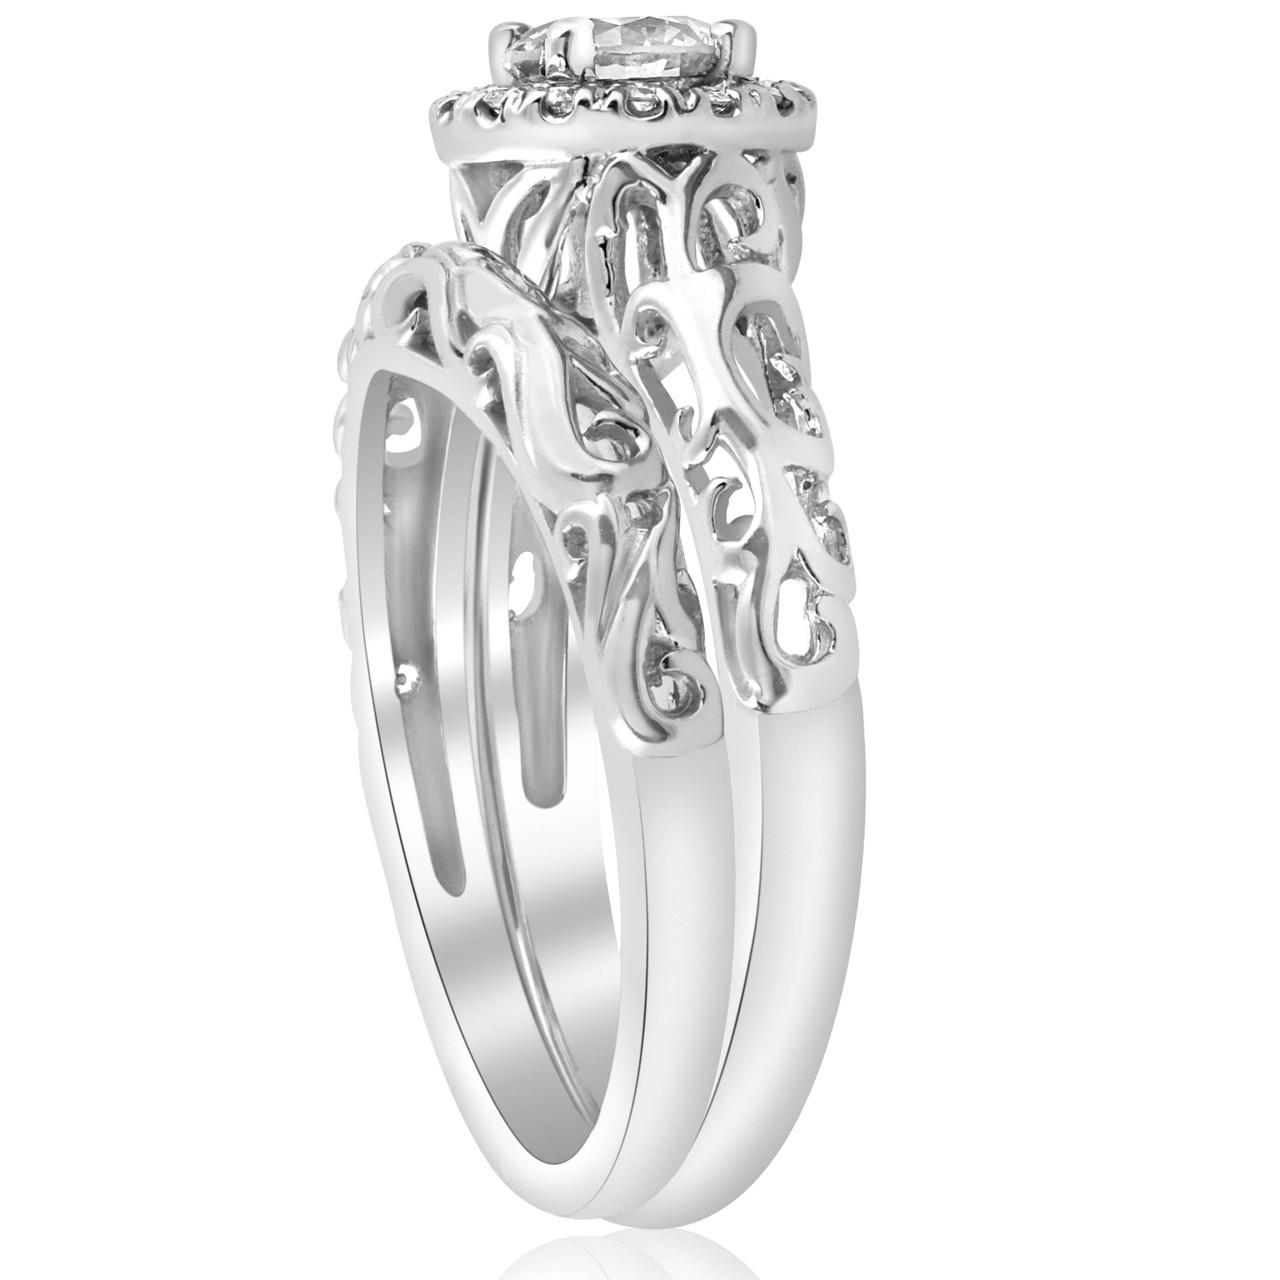 d6a43af4cda ... 5 8ct Round Diamond Vintage Engagement Wedding Ring Set 14K White Gold